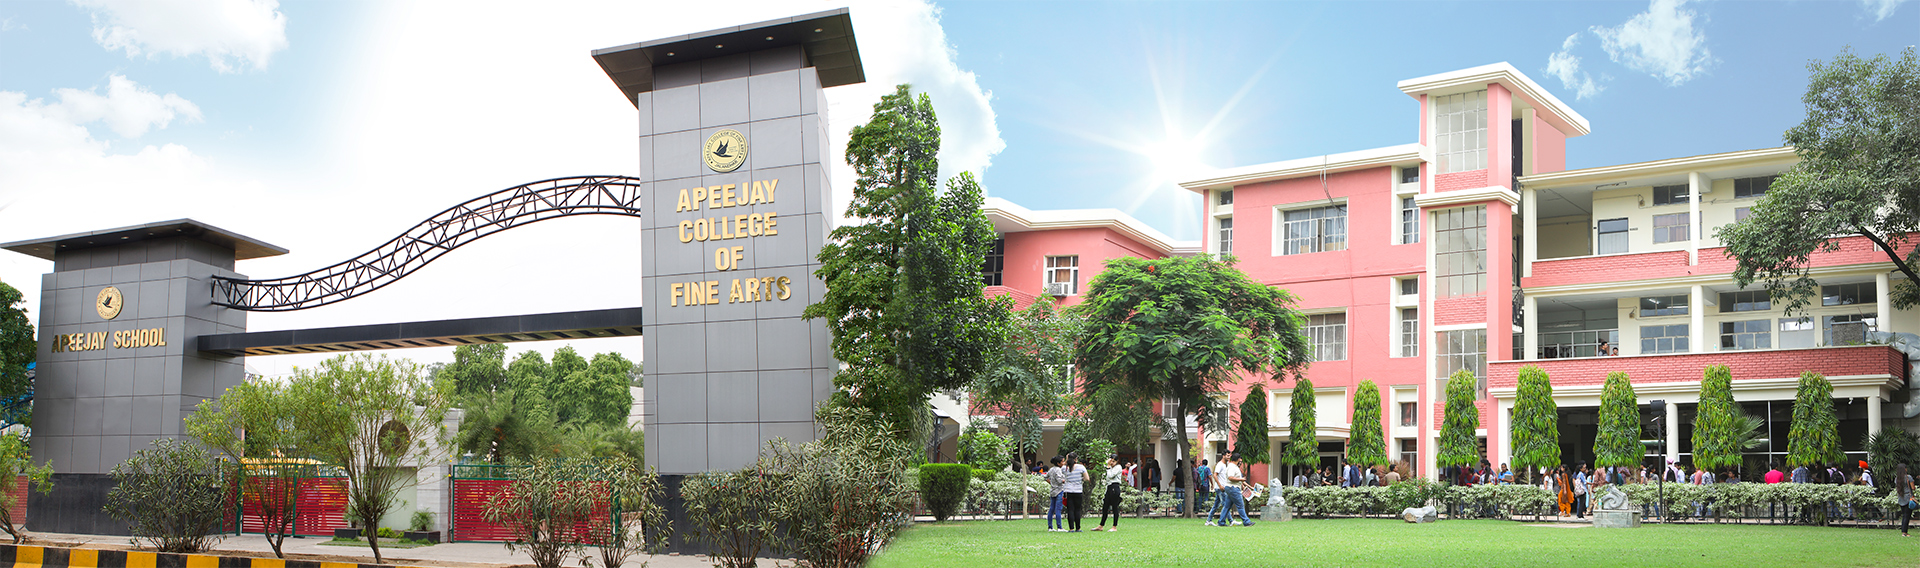 Apeejay College of Fine Arts, Jalandhar